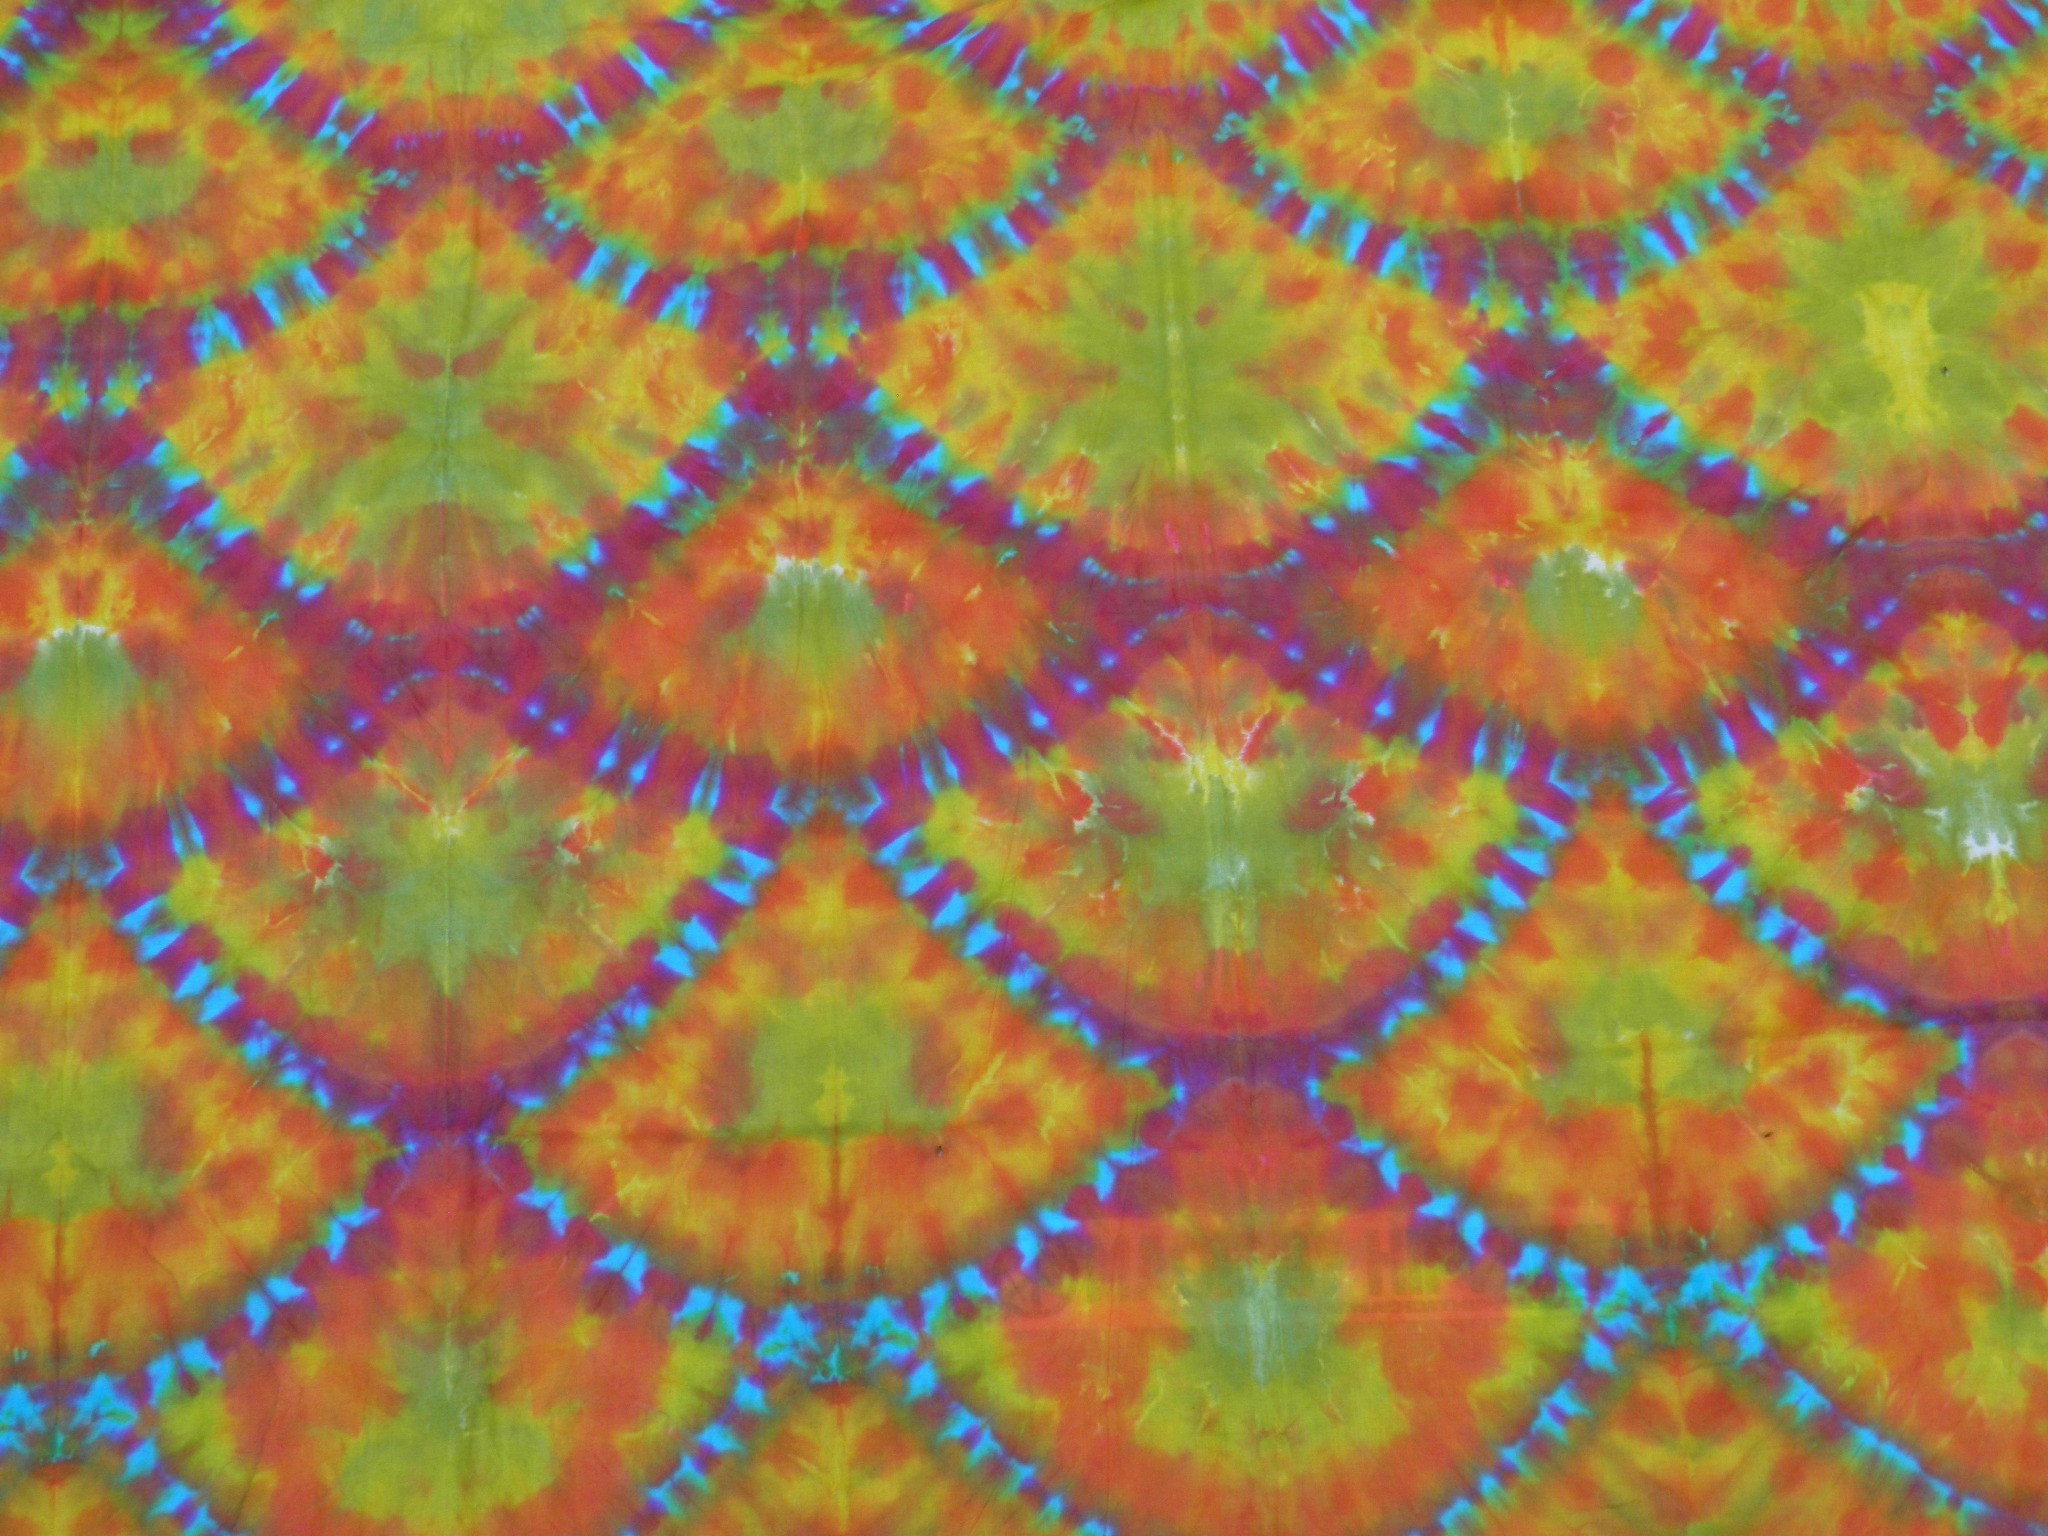 Tie Dye wallpaper ·① Download free High Resolution ...